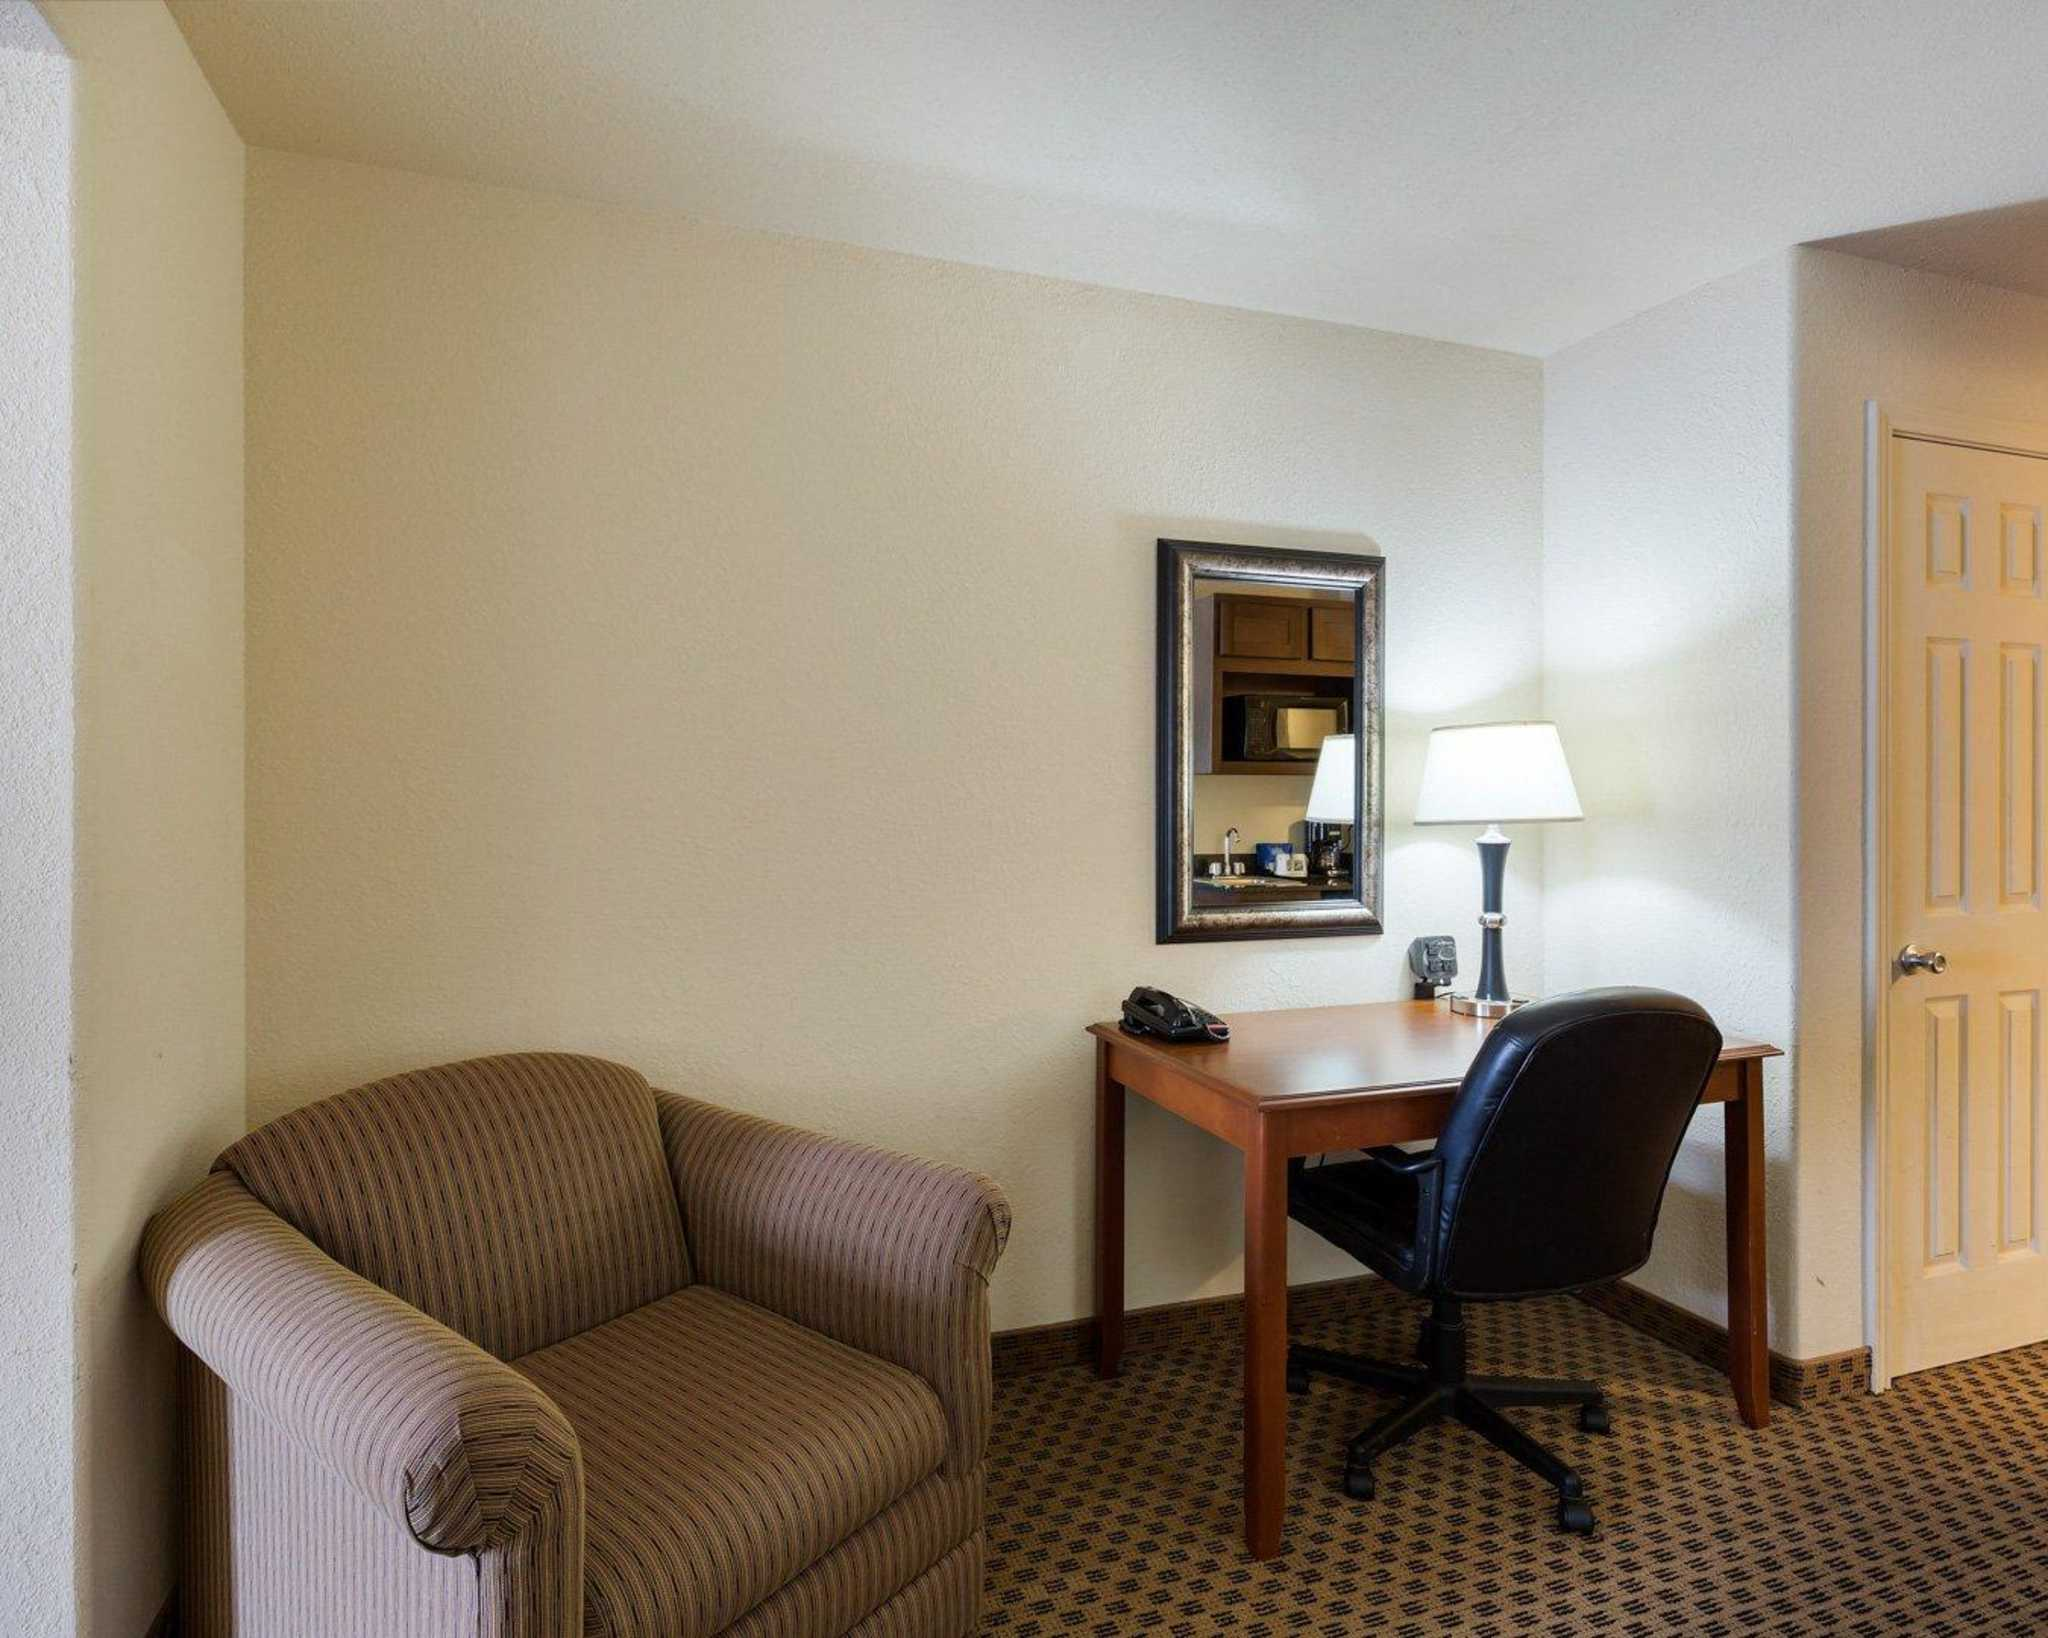 Quality Suites image 19